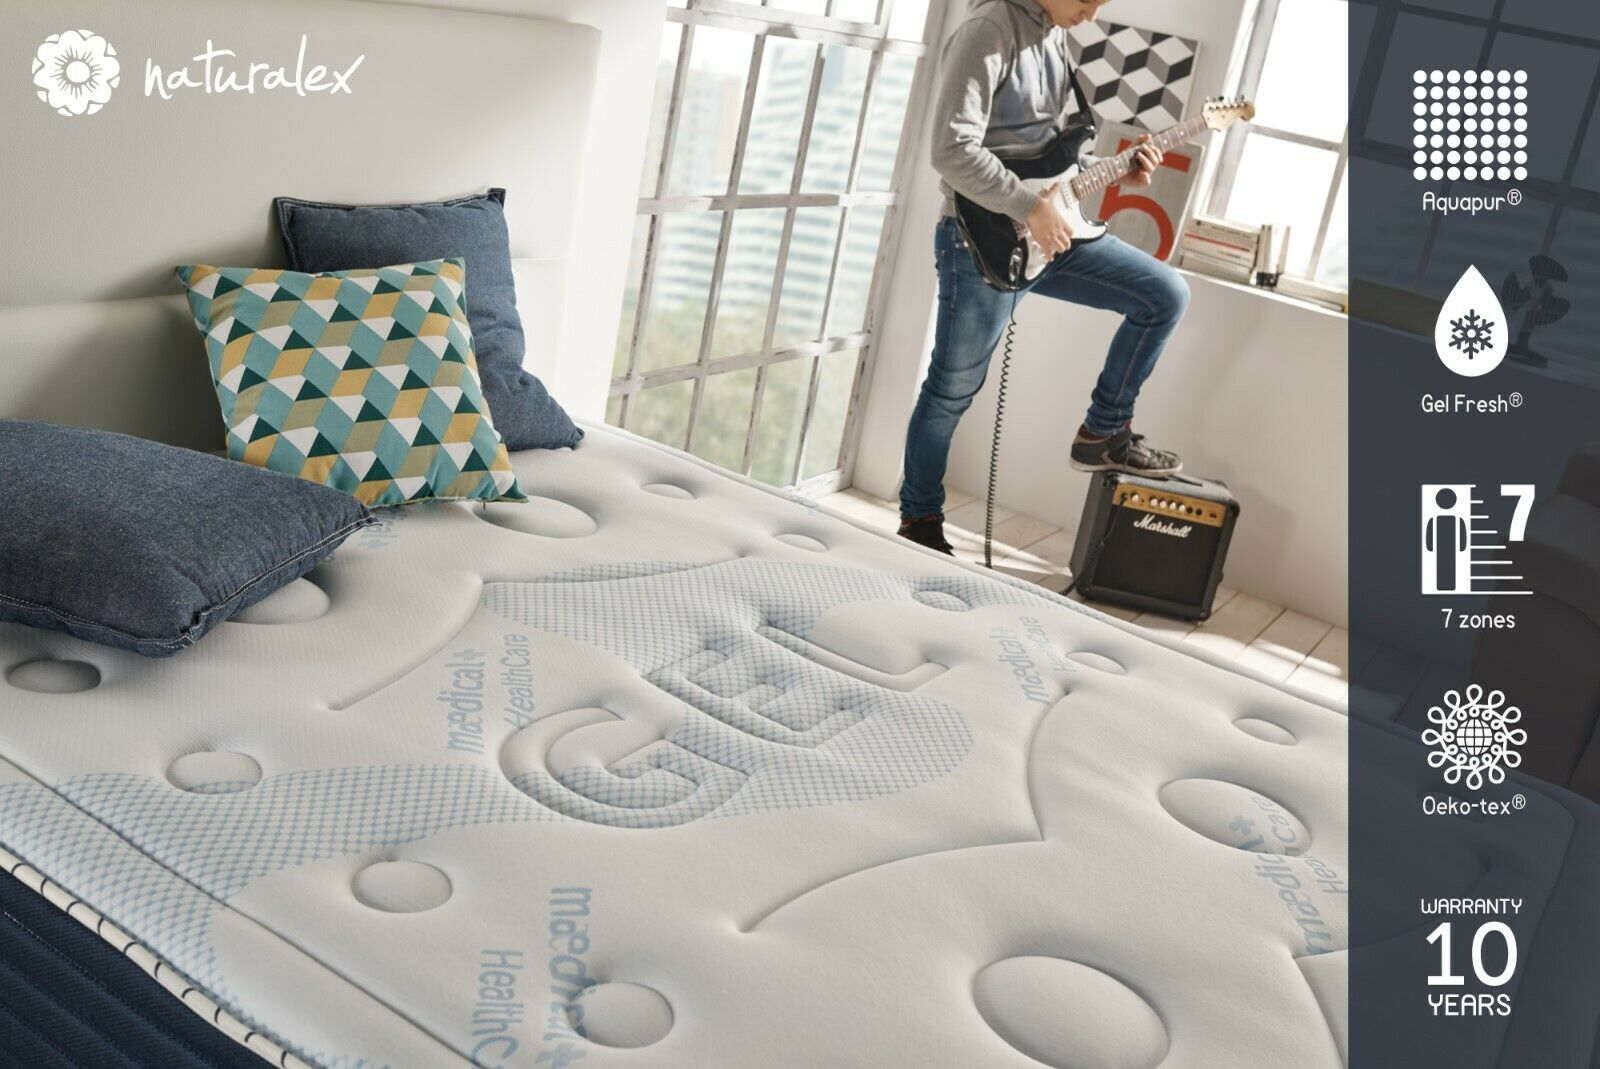 NATURALEX   Comfort Spa Padded Memory Foam Mattress   Medium Firmness All Größes